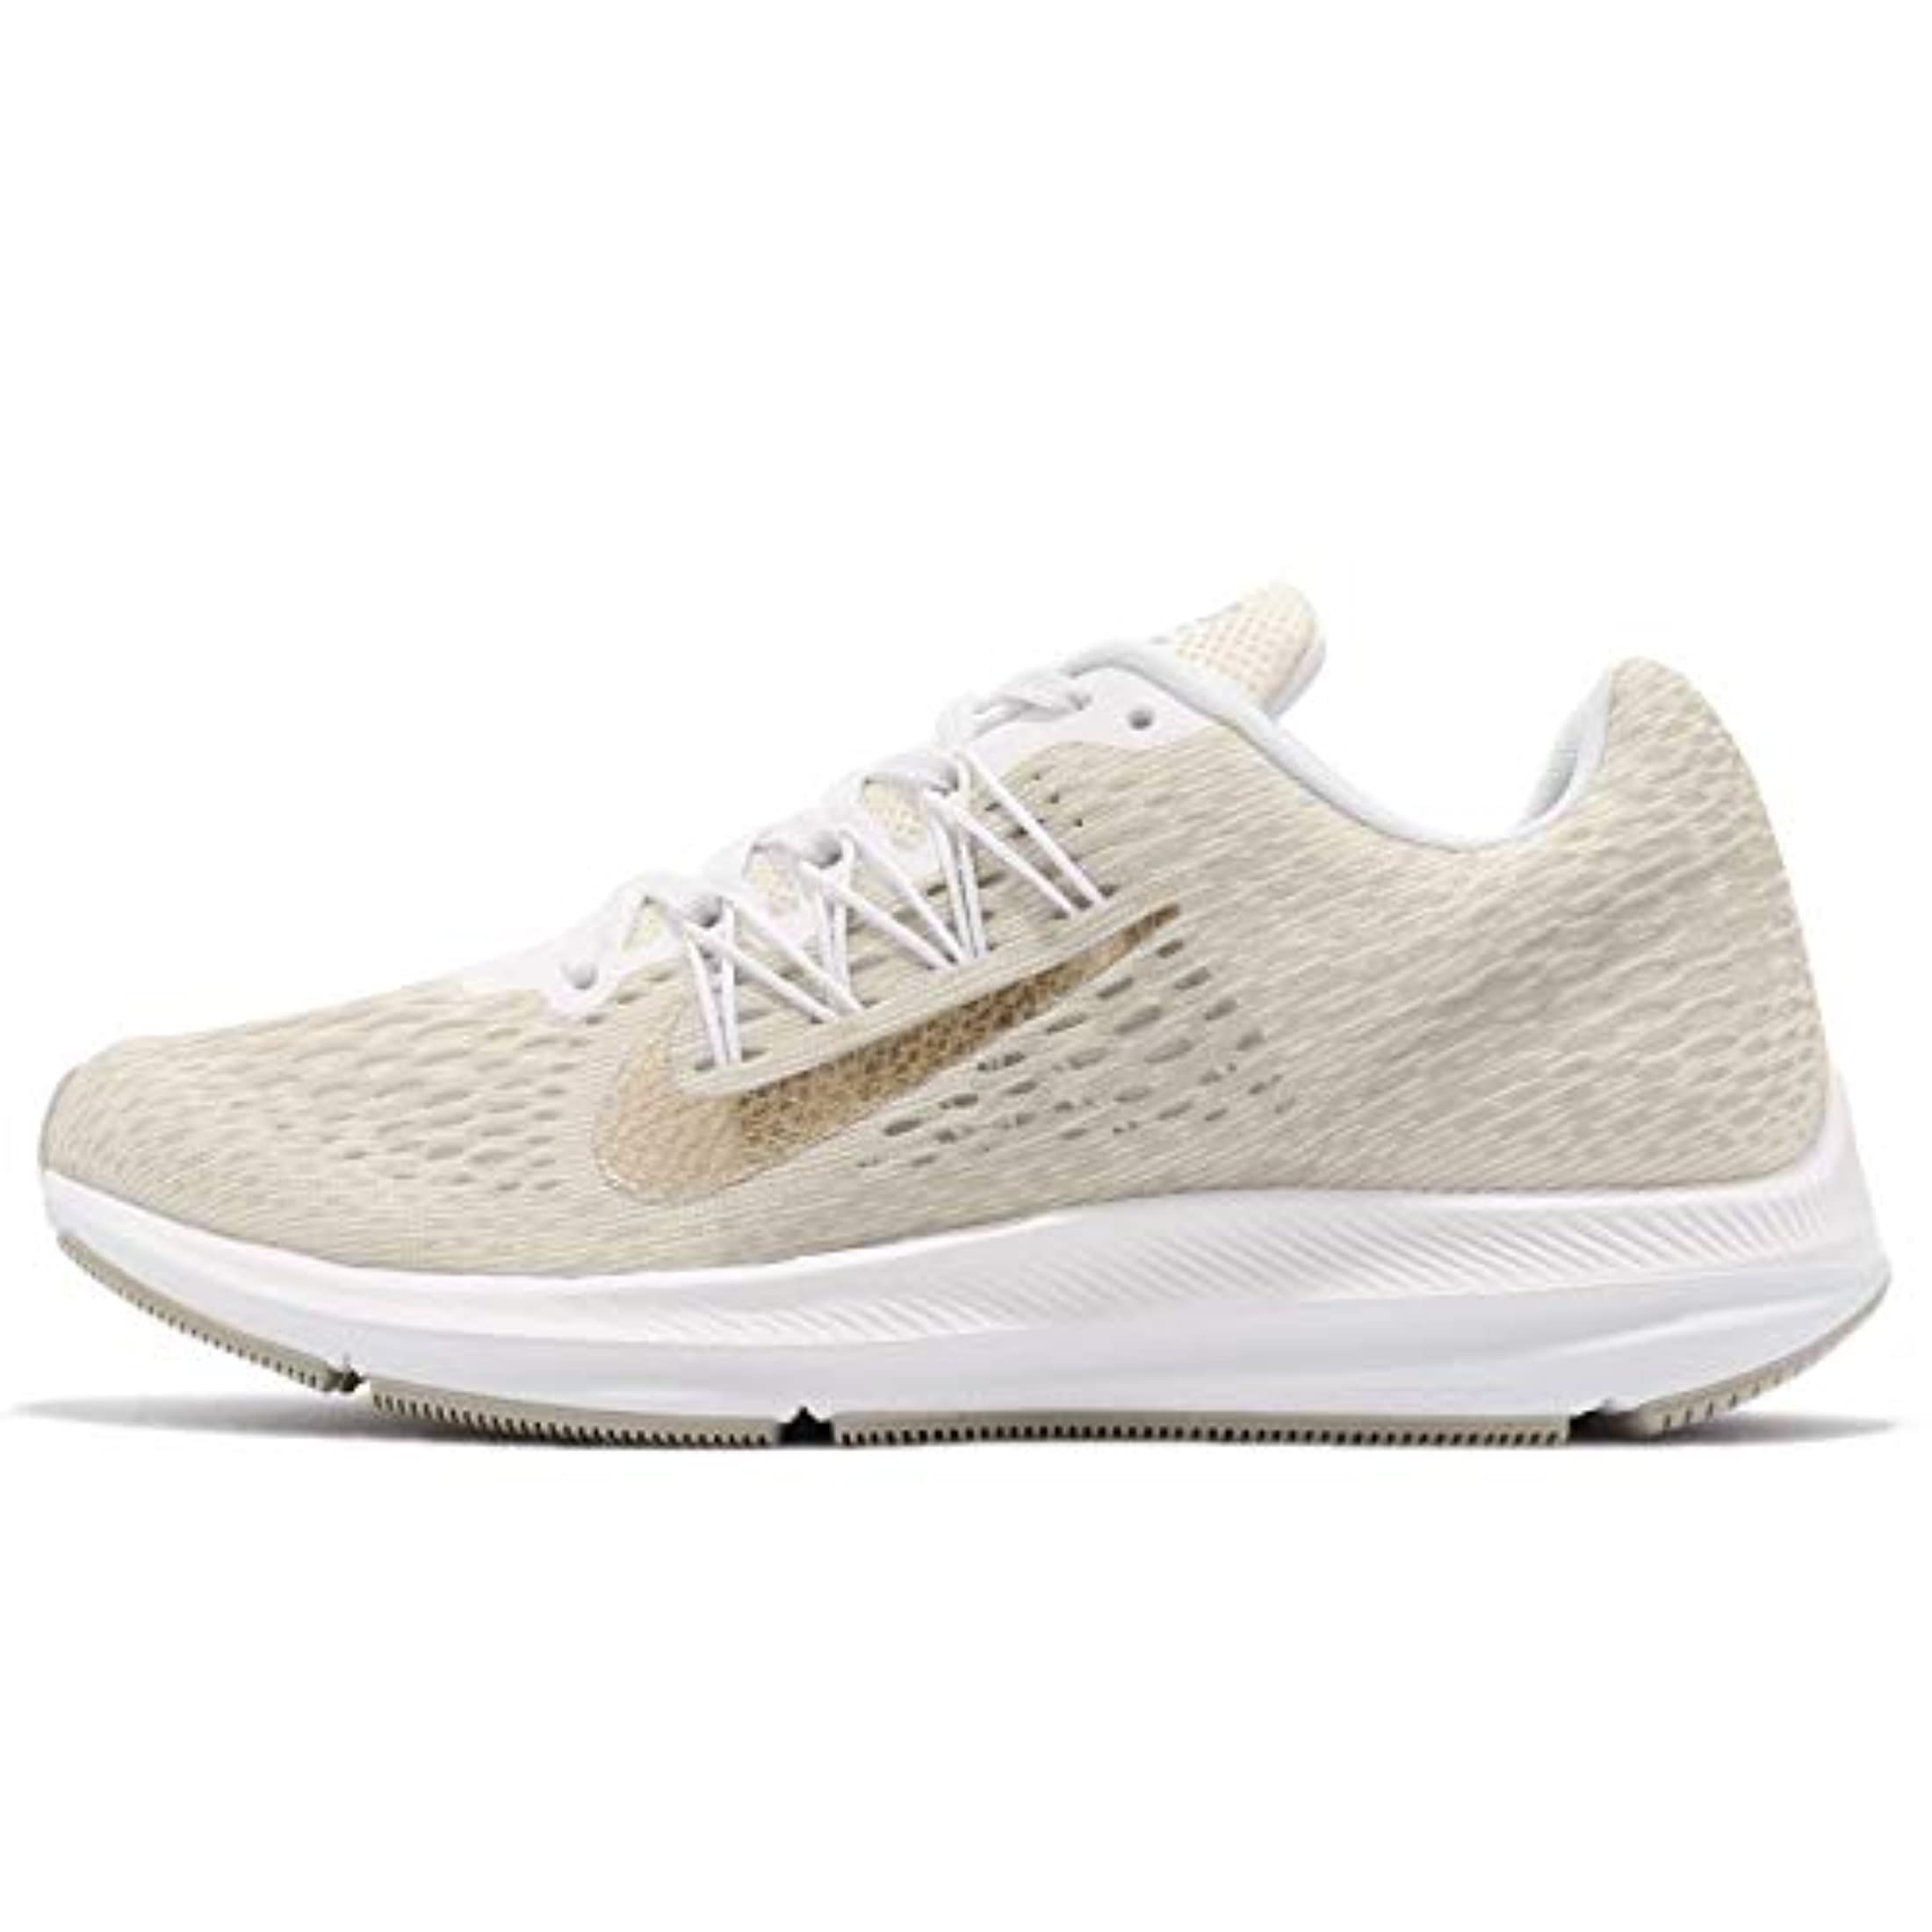 4a01e81ec NIKE Women's Air Zoom Winflo 5 Running Shoe, Phantom/Metallic  Gold-String-White, 8.5